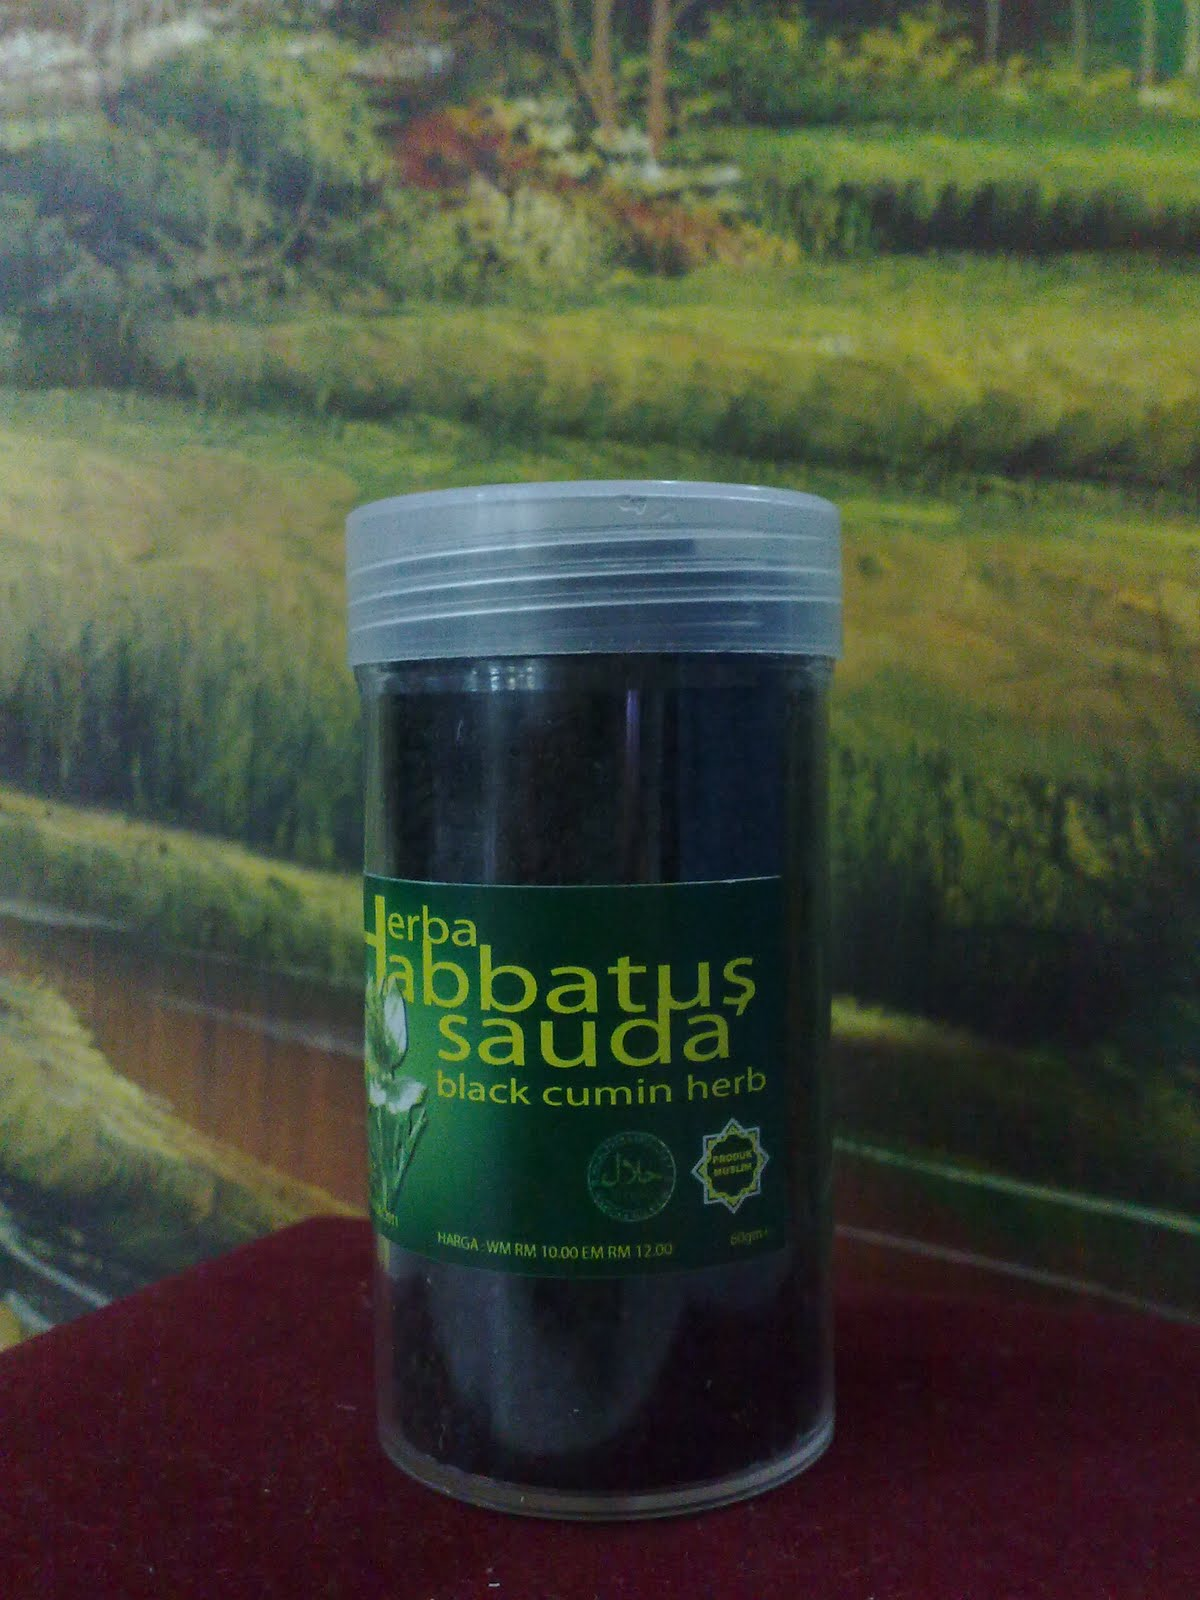 [Herba+Habbatus+Sauda+60grm+(Rm+10.00)]